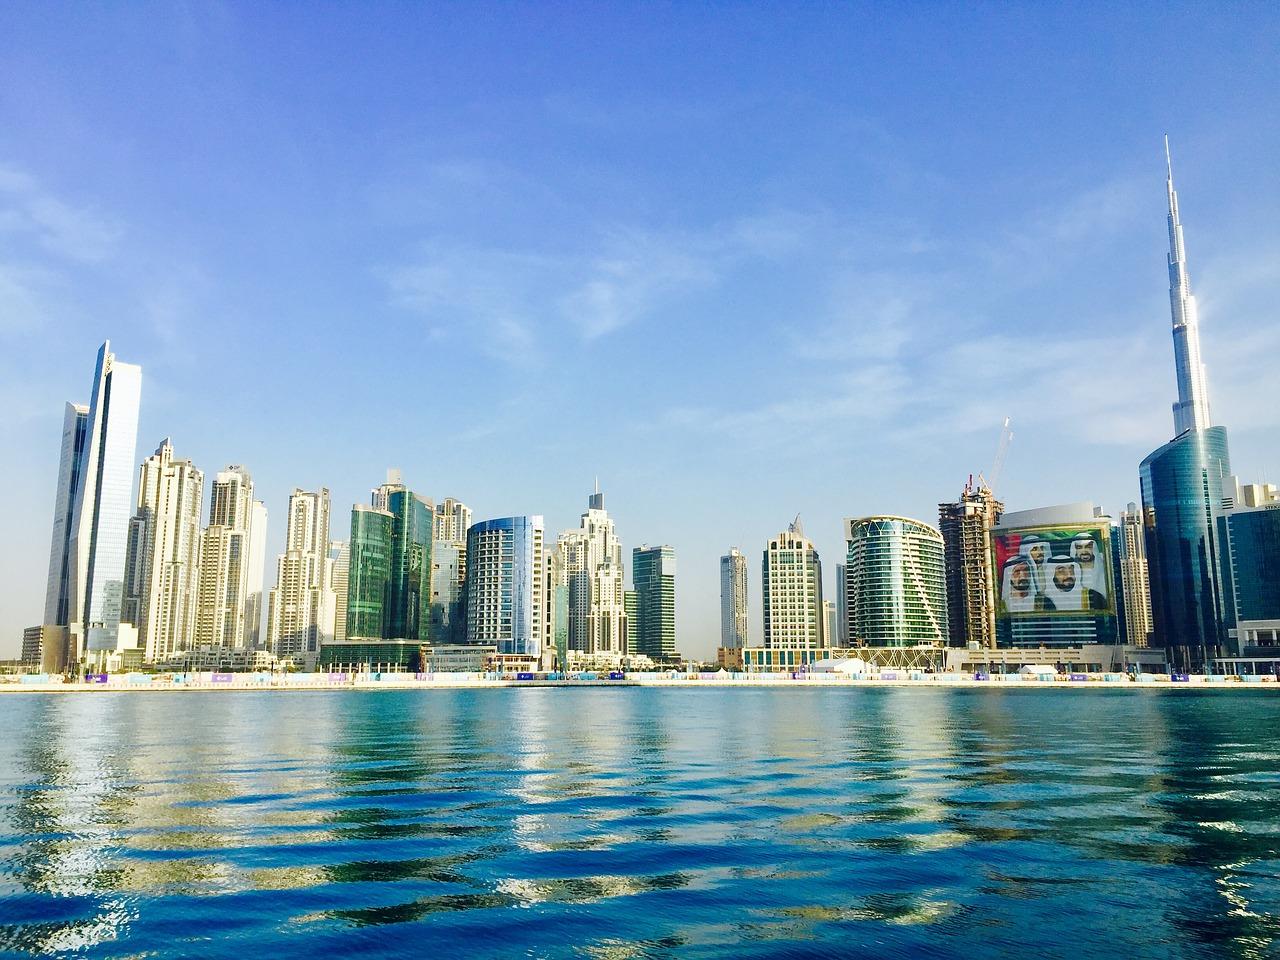 Dubaï - CC0 Creative Commons